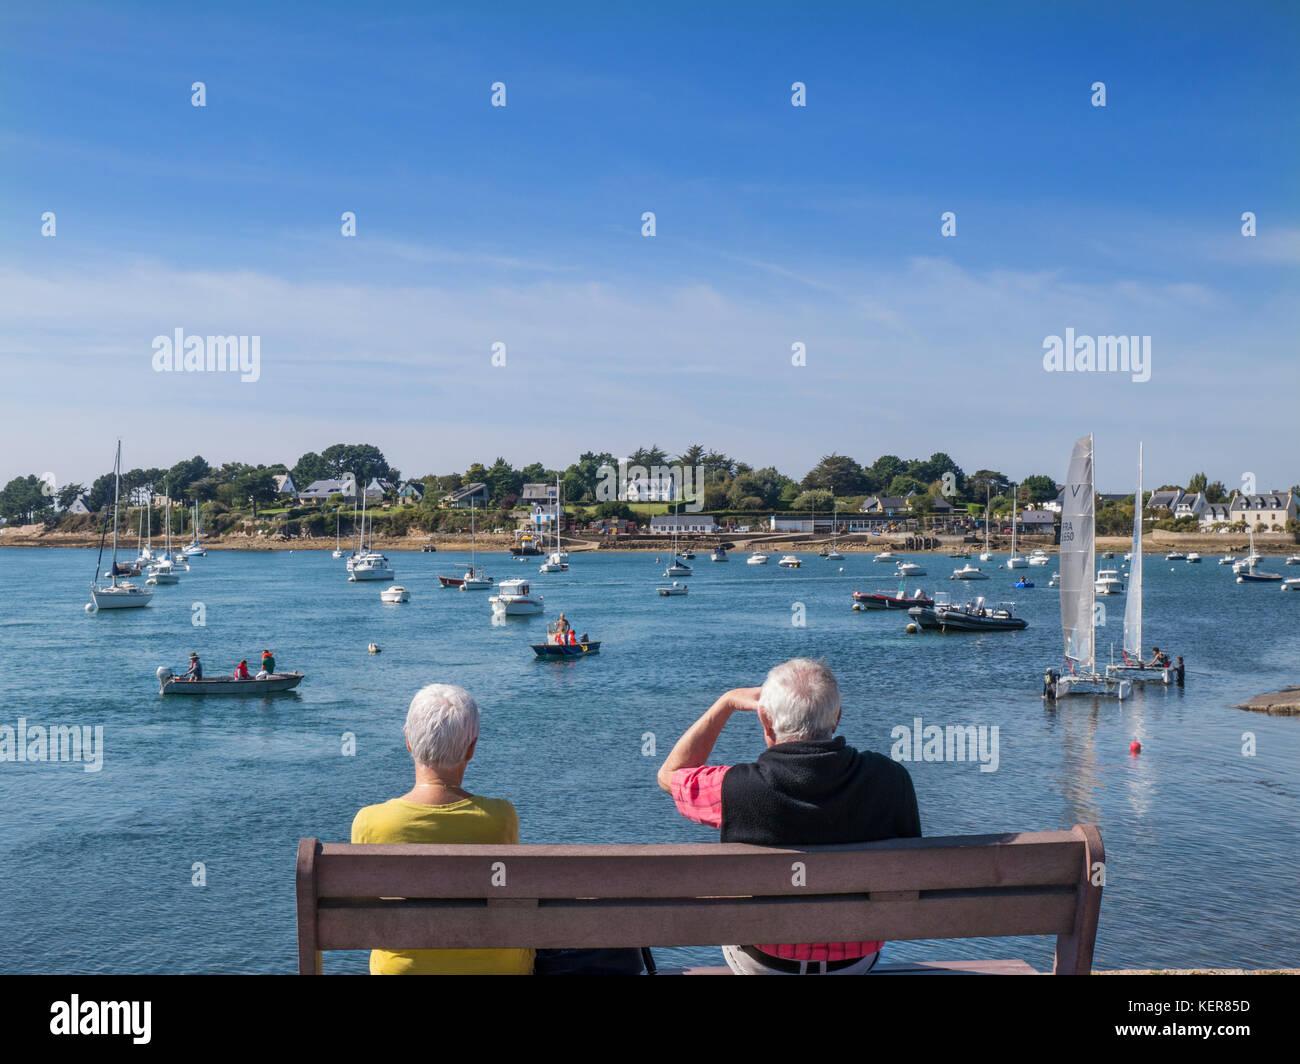 Mature couple sitting on bench at Sentier de la Plage, watching various boating activities Golfe du Morbihan, Larmor - Stock Image